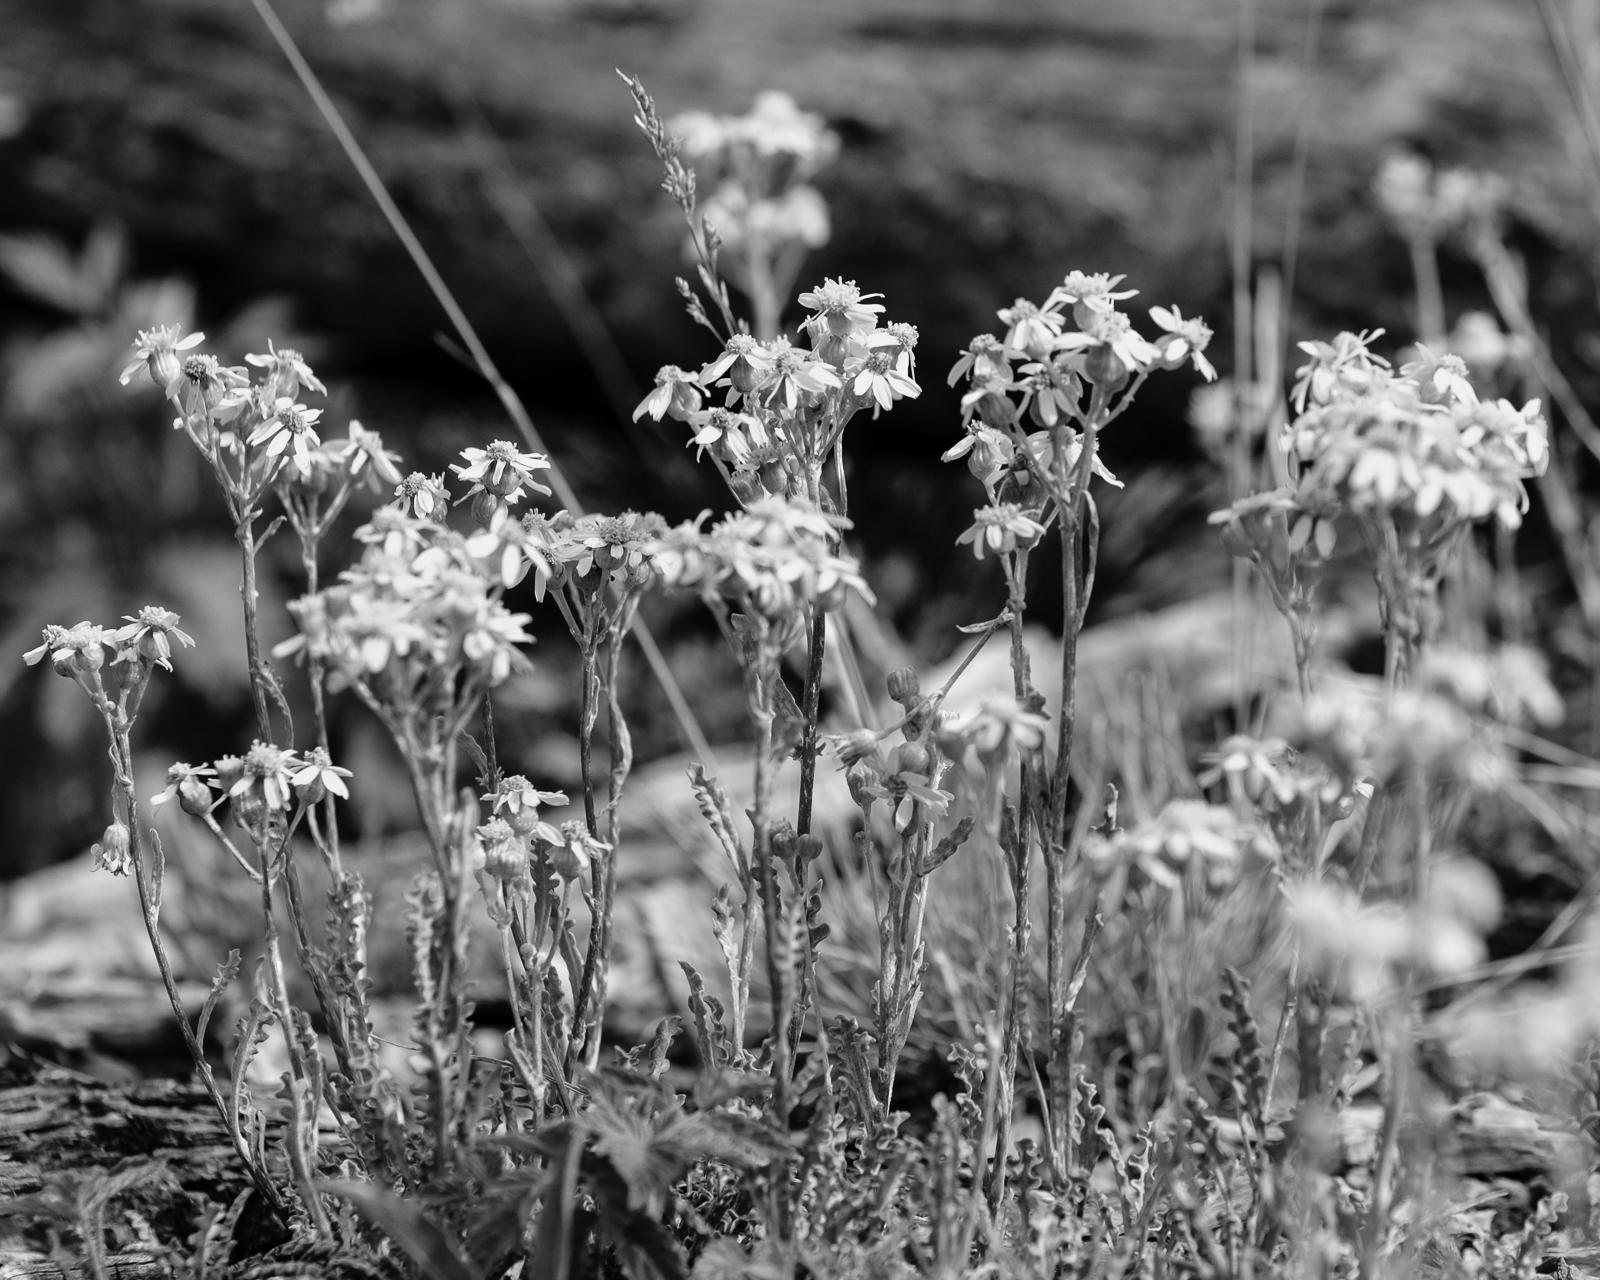 Day 169- 365 Day B&W Photo Challenge - Blooming Daisies -  Fujifilm X-T3, Acros Ye Film Simulation